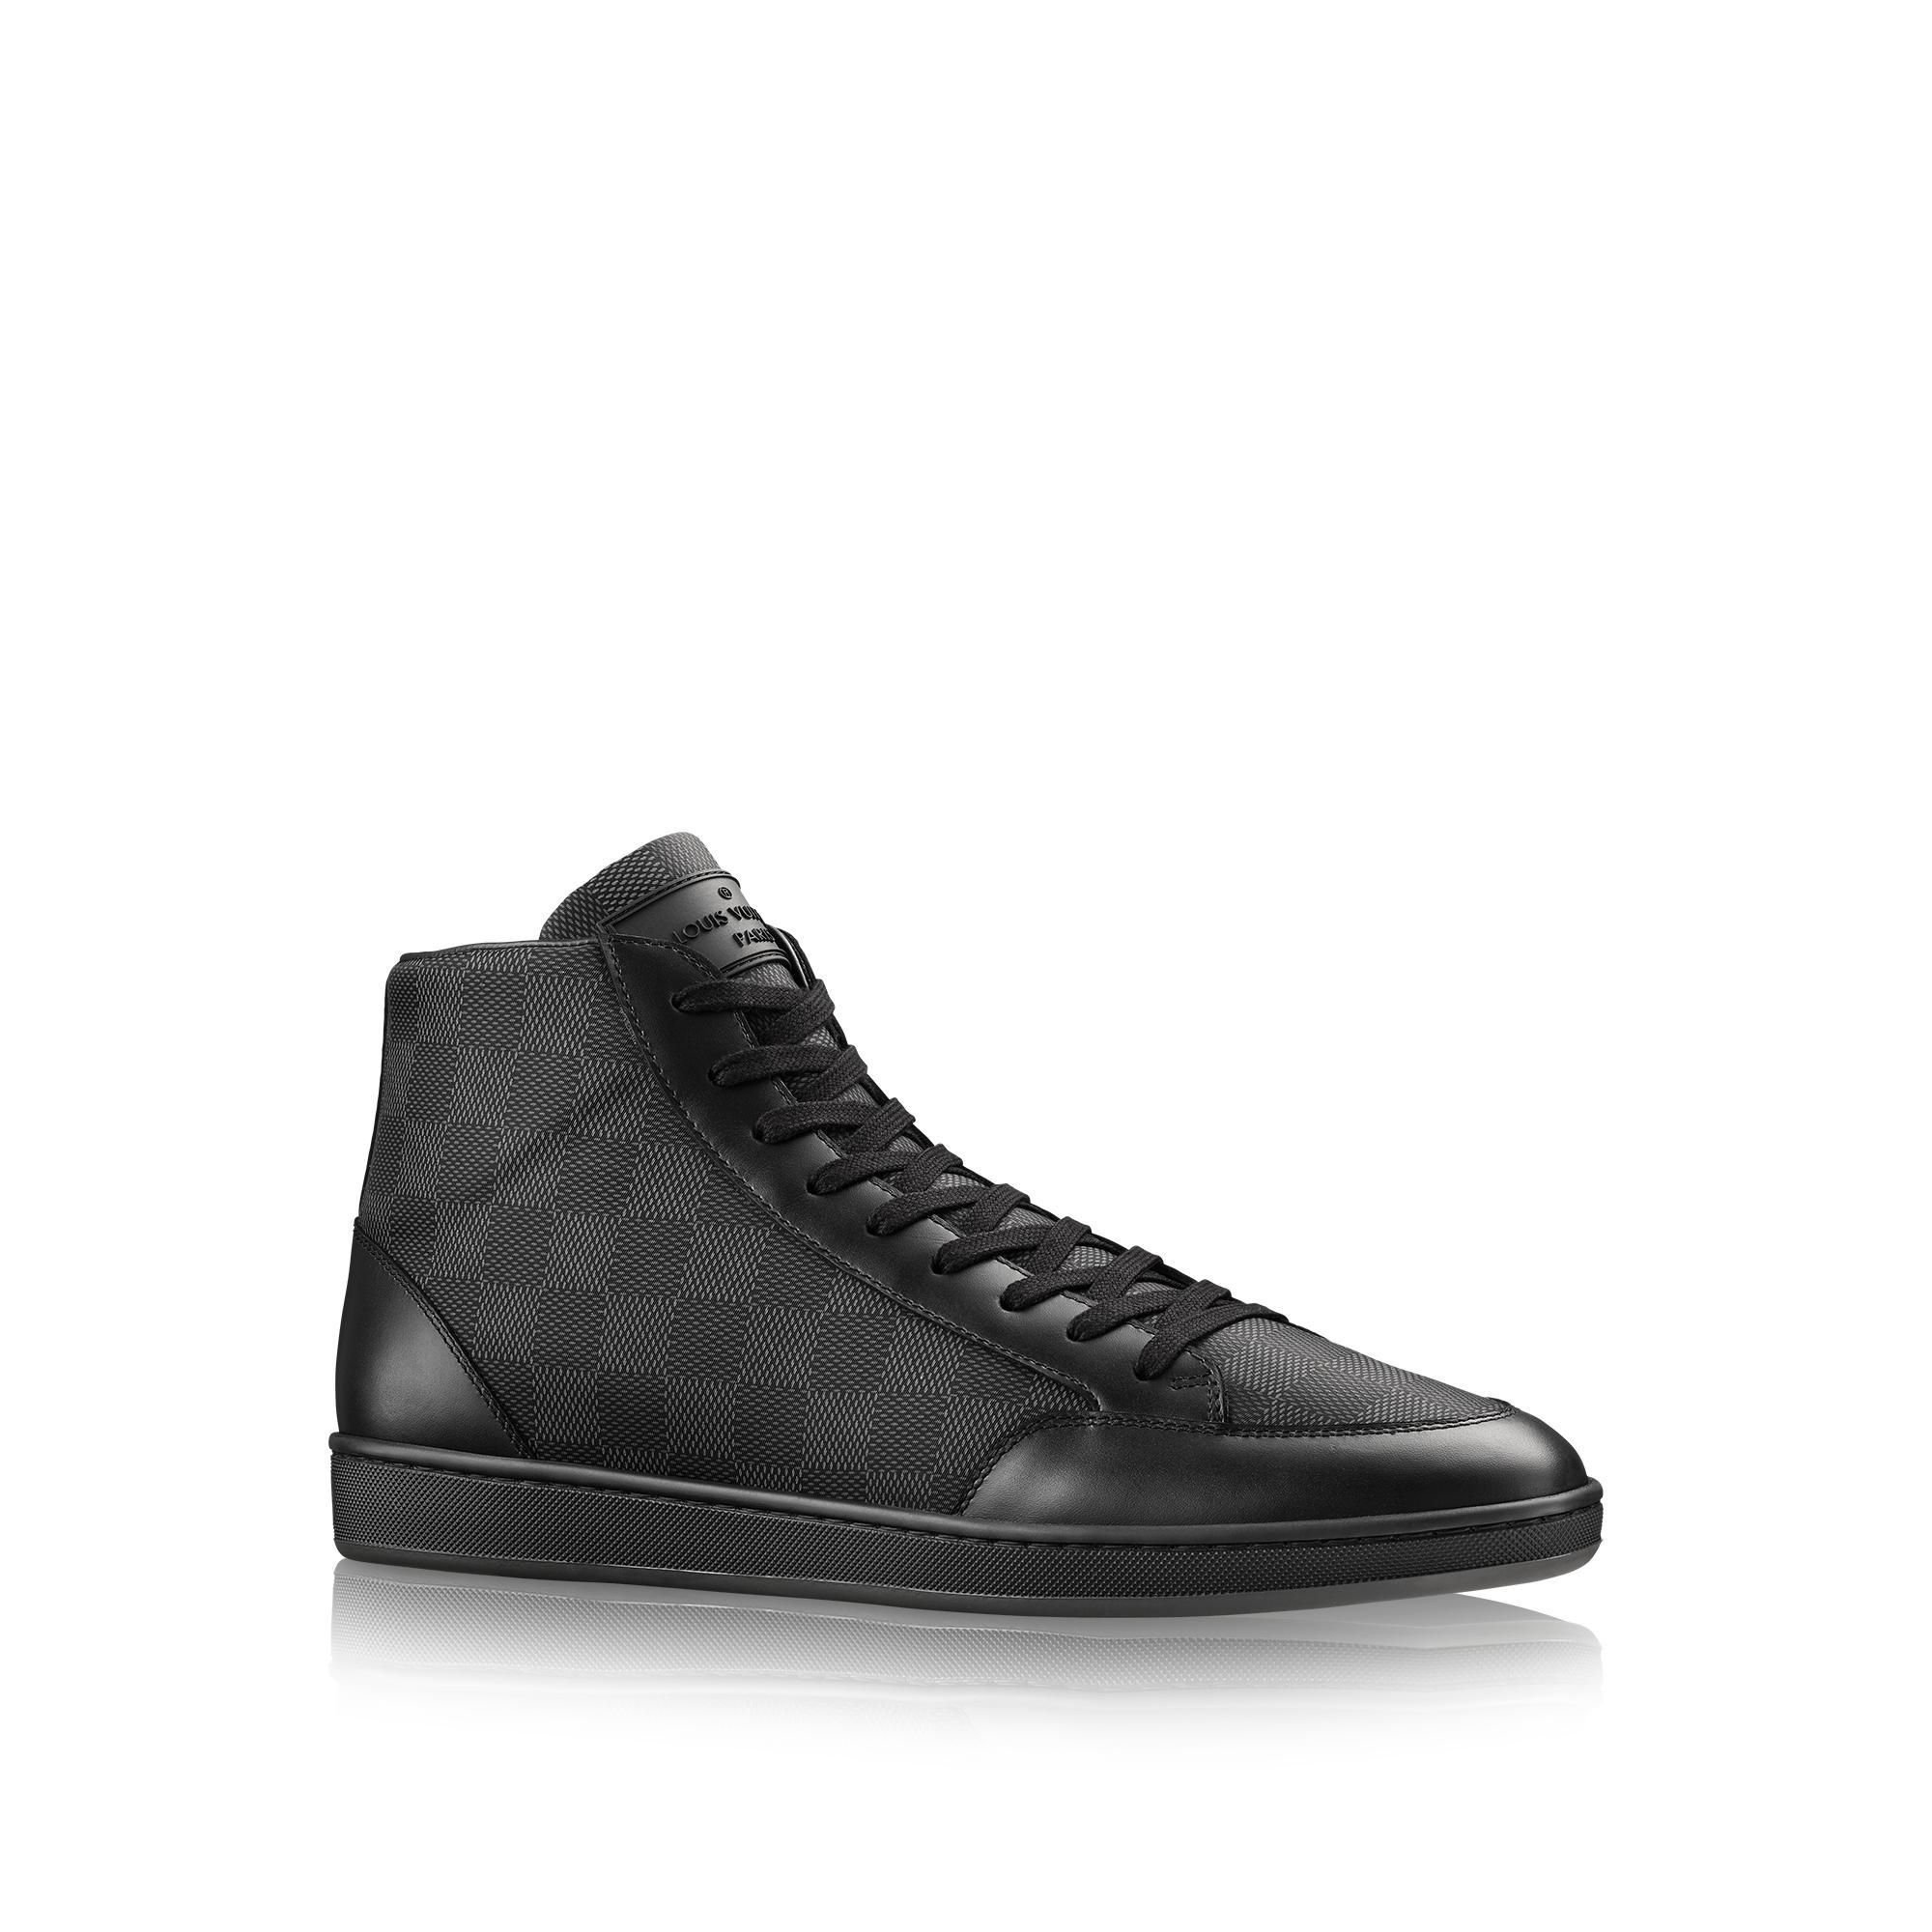 Louis Vuitton Offshore Sneaker Boot Louisvuitton Shoes Louis Vuitton Sneakers Louis Vuitton Shoes Sneakers Sneakers Men Fashion